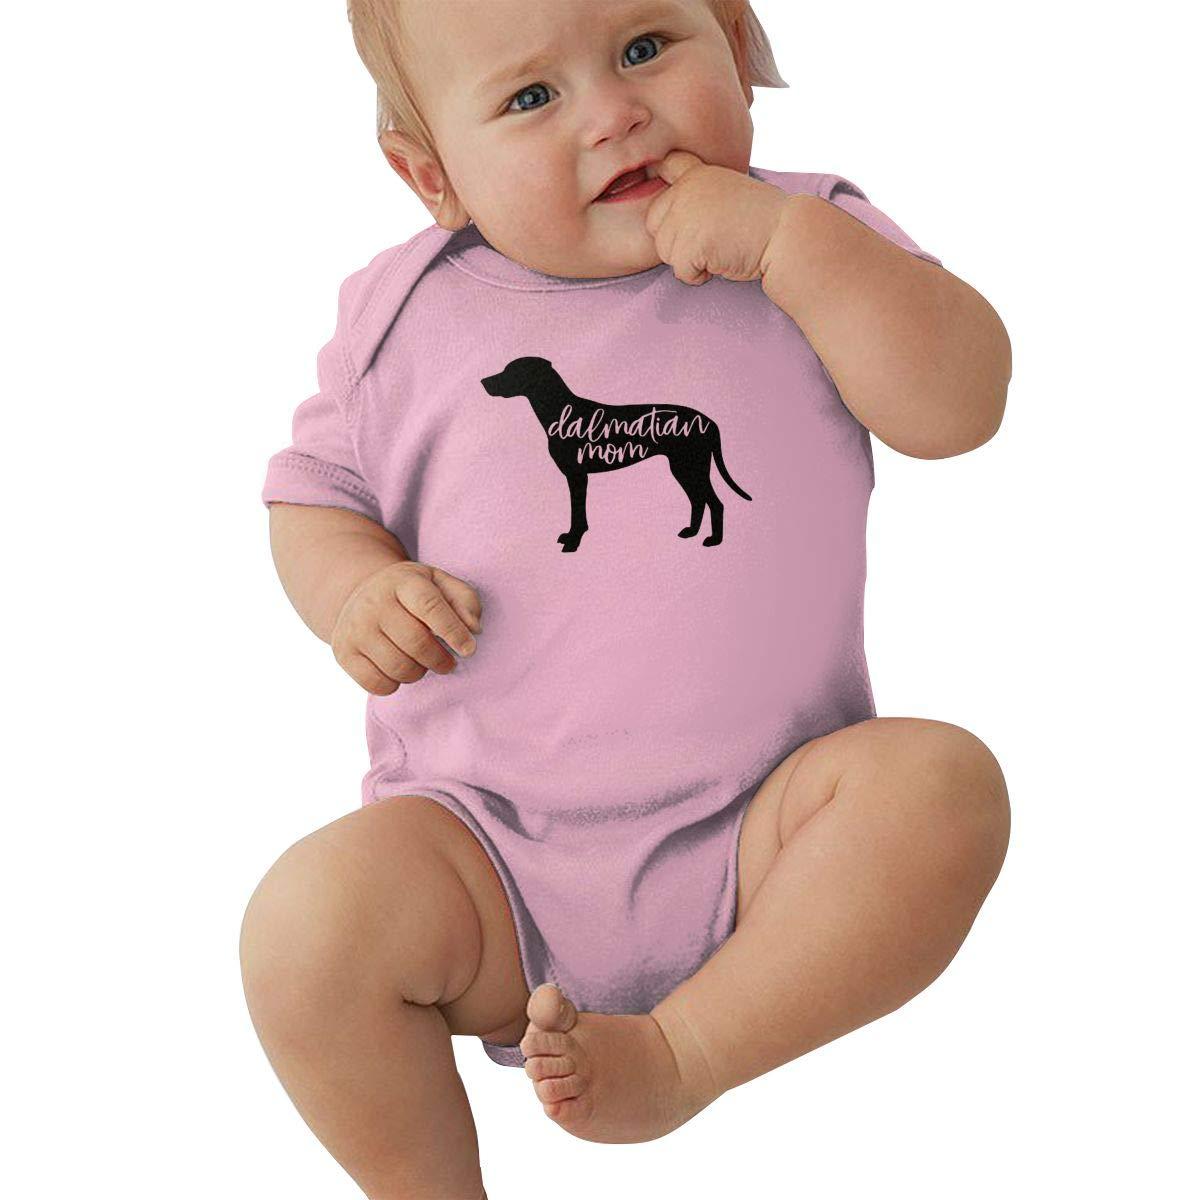 Mri-le2 Toddler Baby Boy Girl Short Sleeve Organic Bodysuit Dalmatian Mom 1 Baby Rompers